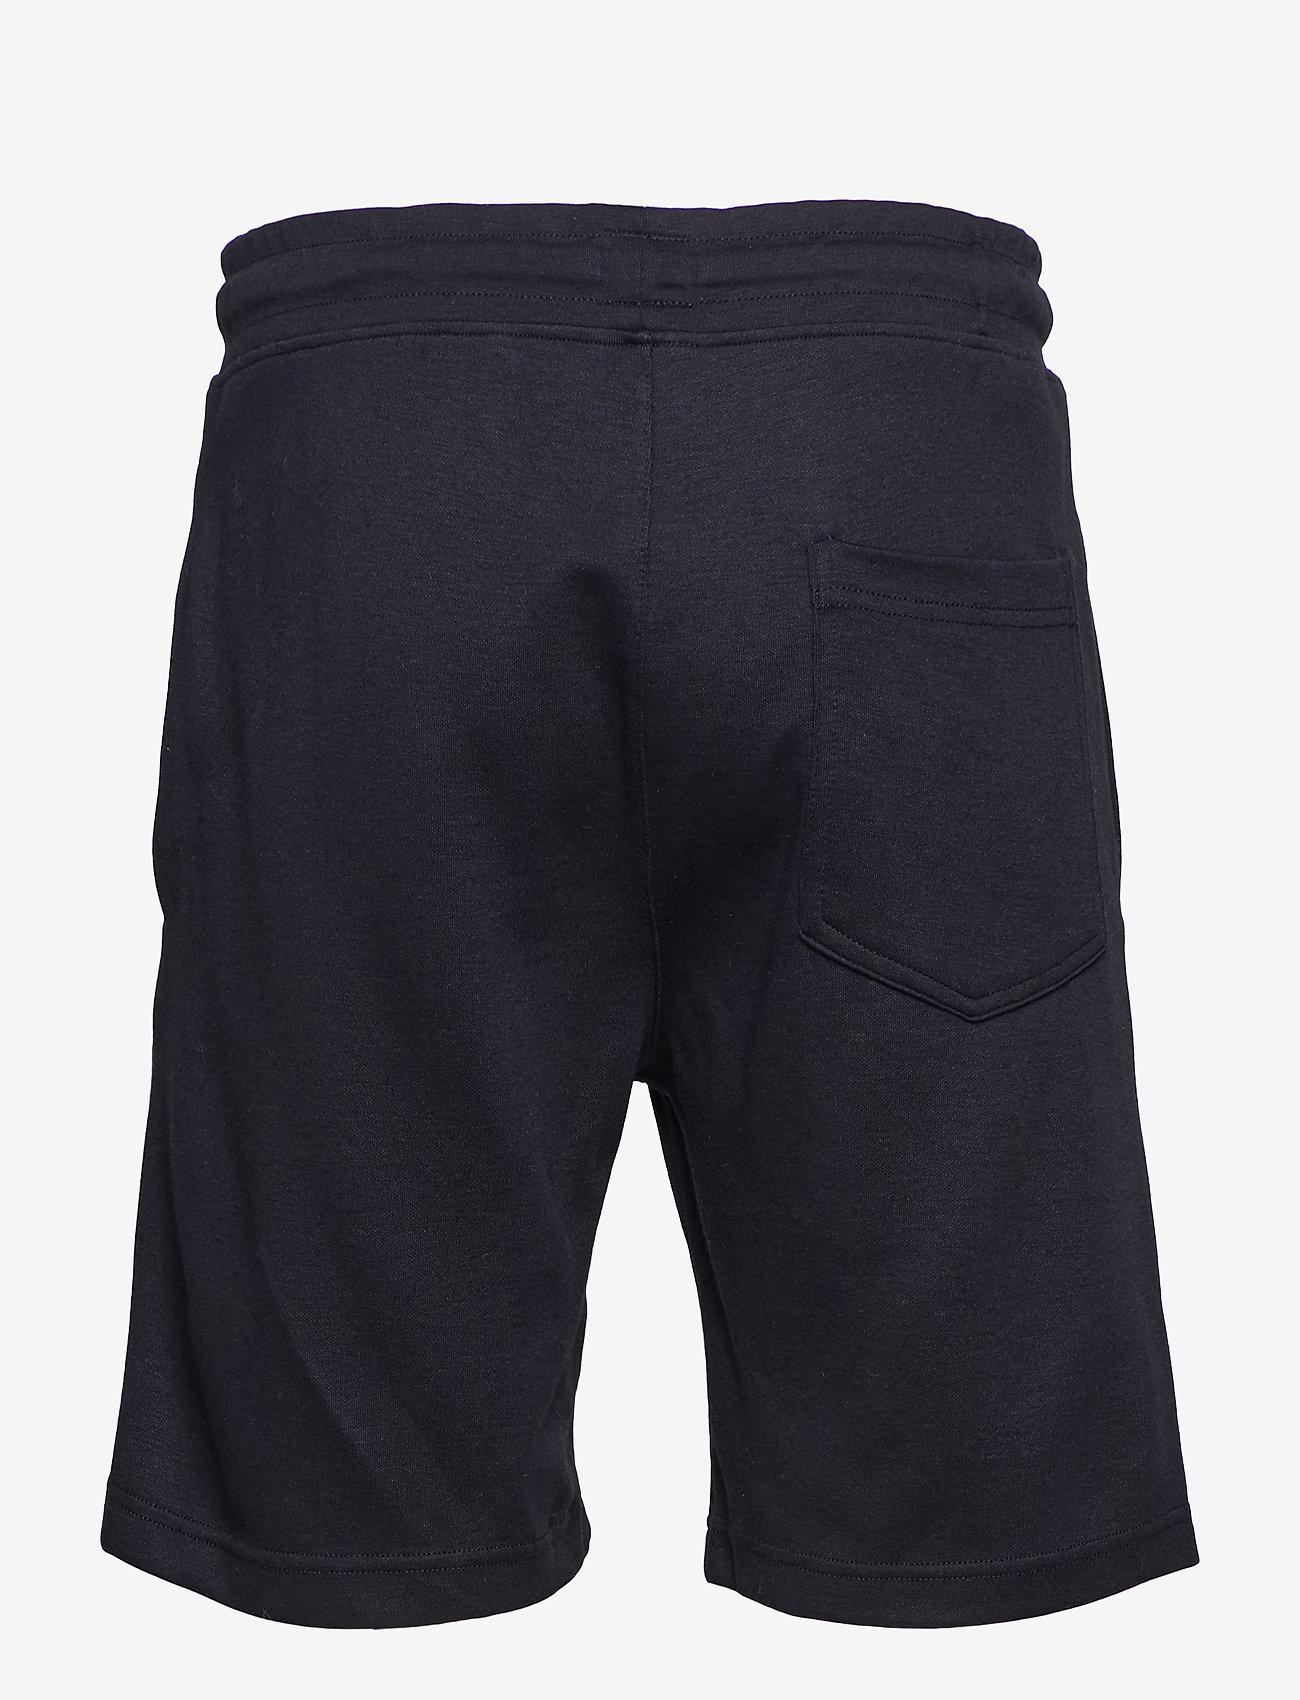 Jbs Of Denmarkjbs Denmark, Bamboo Shorts - Nachtwäsche